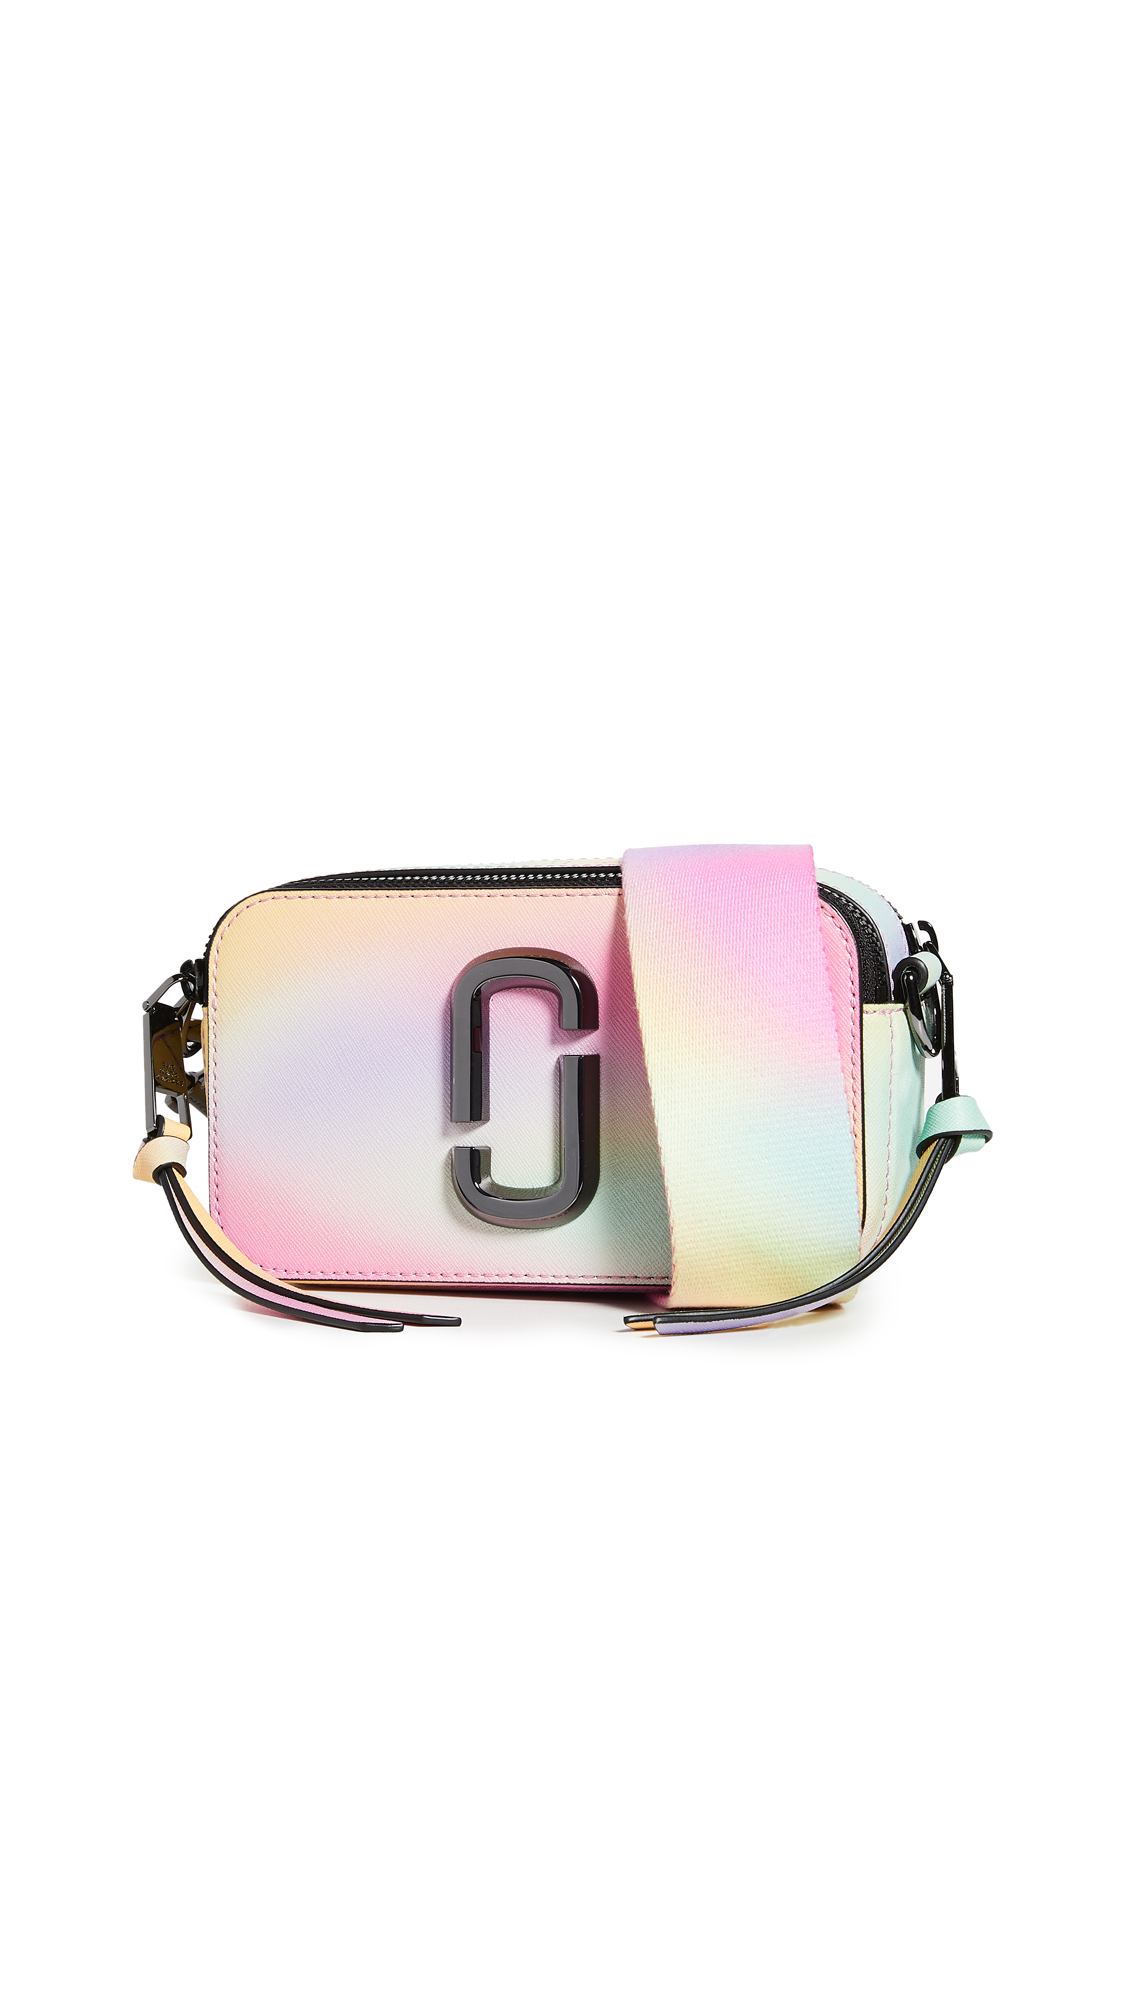 Marc Jacobs Snapshot Airbrushed Camera Bag